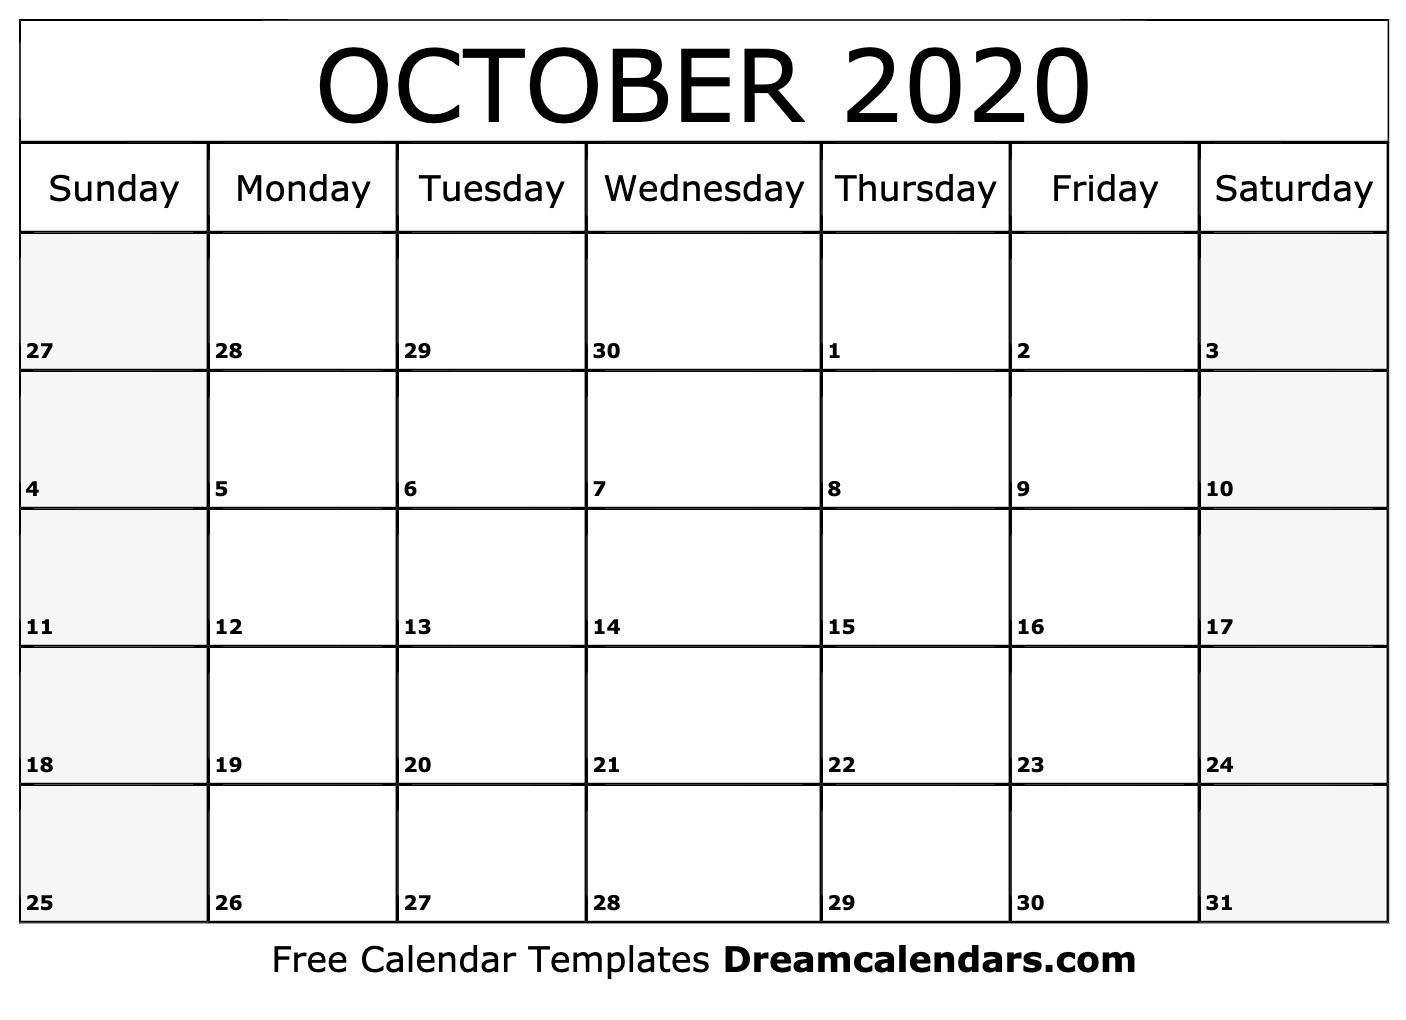 Printable October 2020 Calendar-October 2020 Monthly Calendar Blank Printable